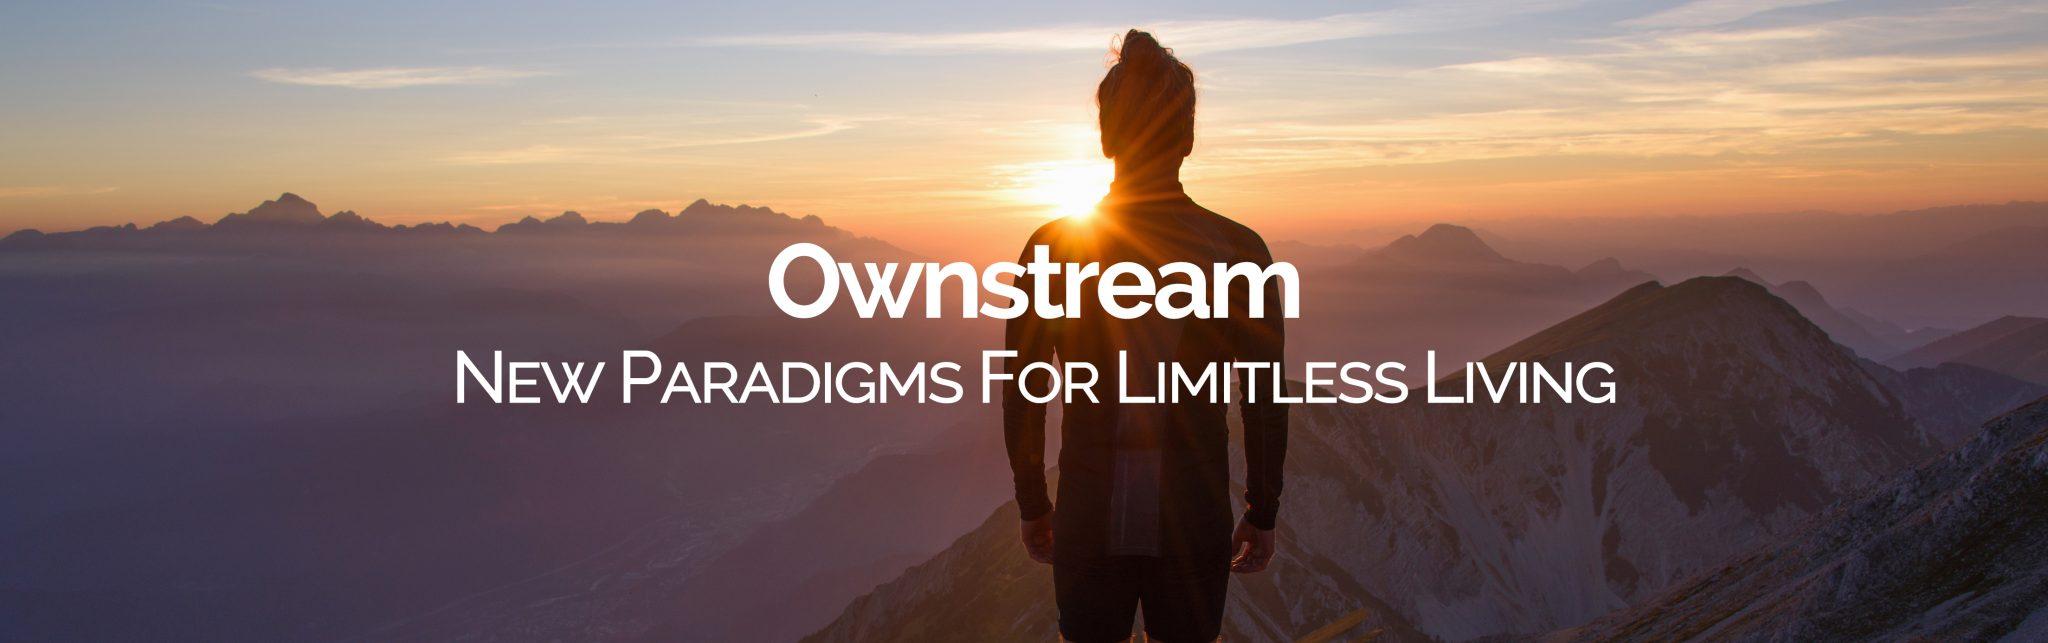 Ownstream